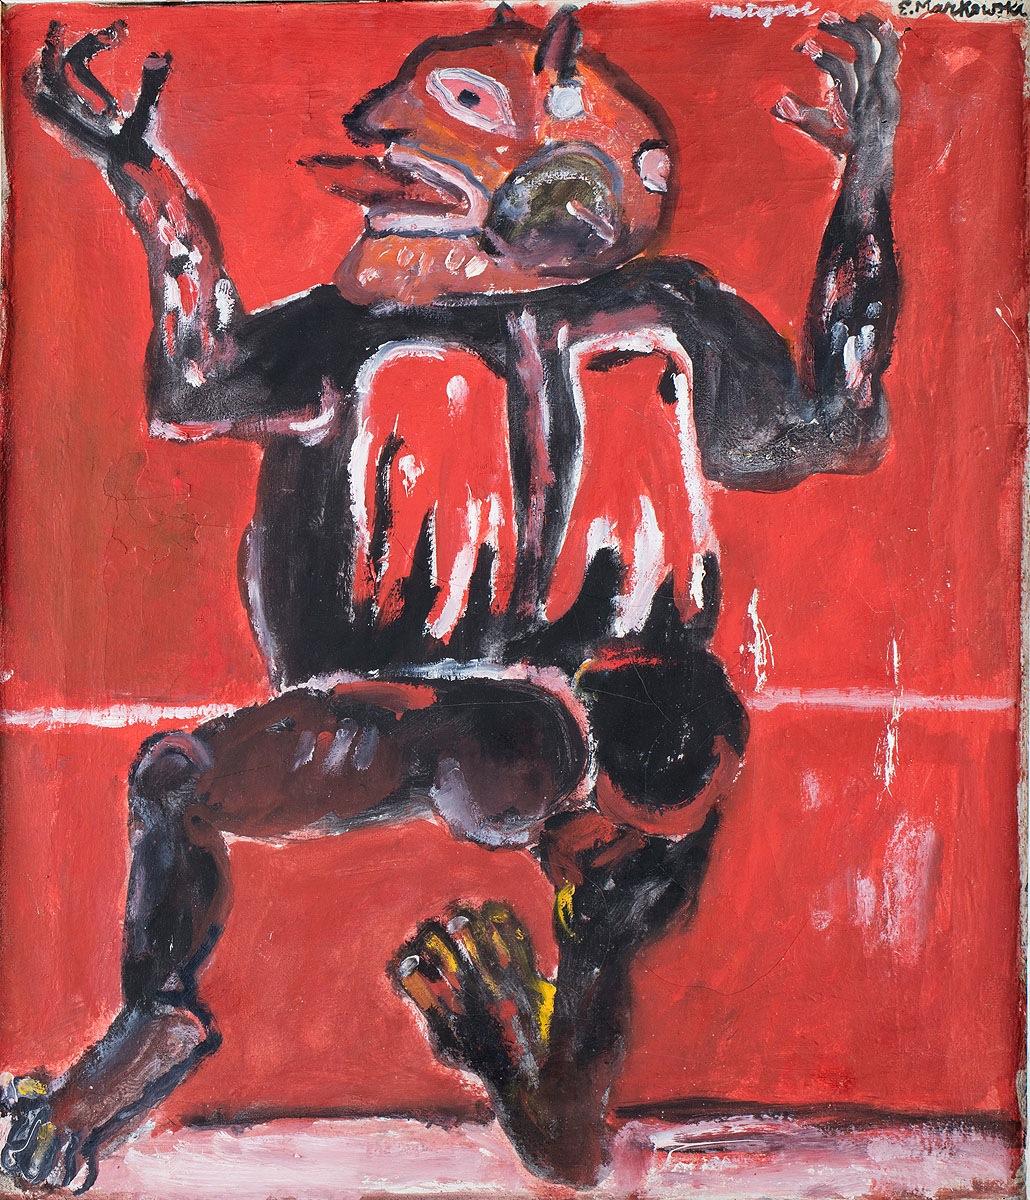 DIAVOLETTO + 1.2.4.4, 1979-90